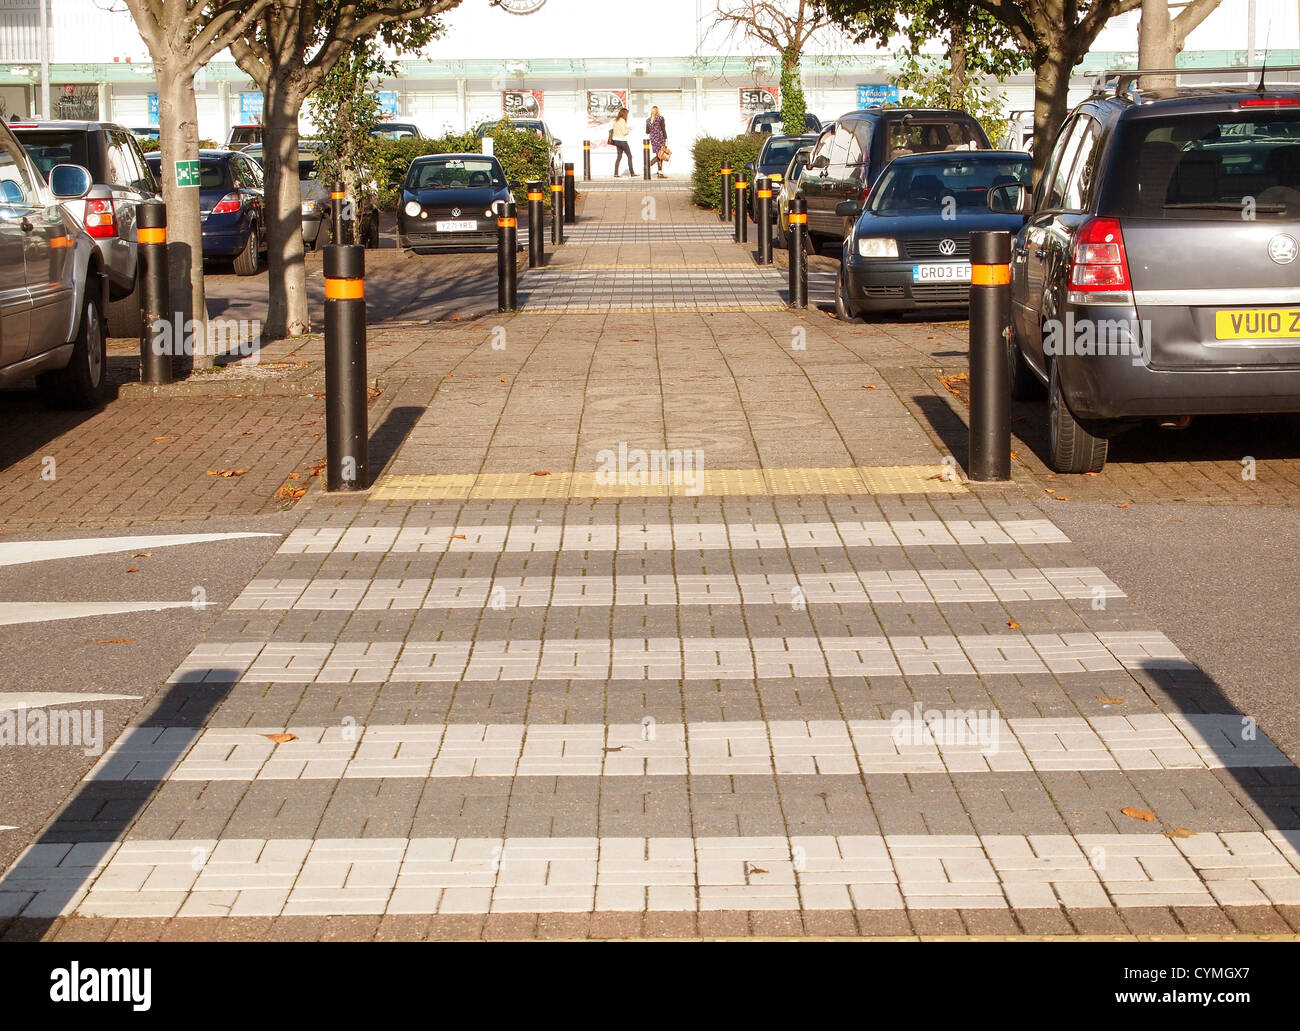 Pedestrian crossing in a retail park, Cribbs Causeway, Bristol, England UK, November 2012 - Stock Image